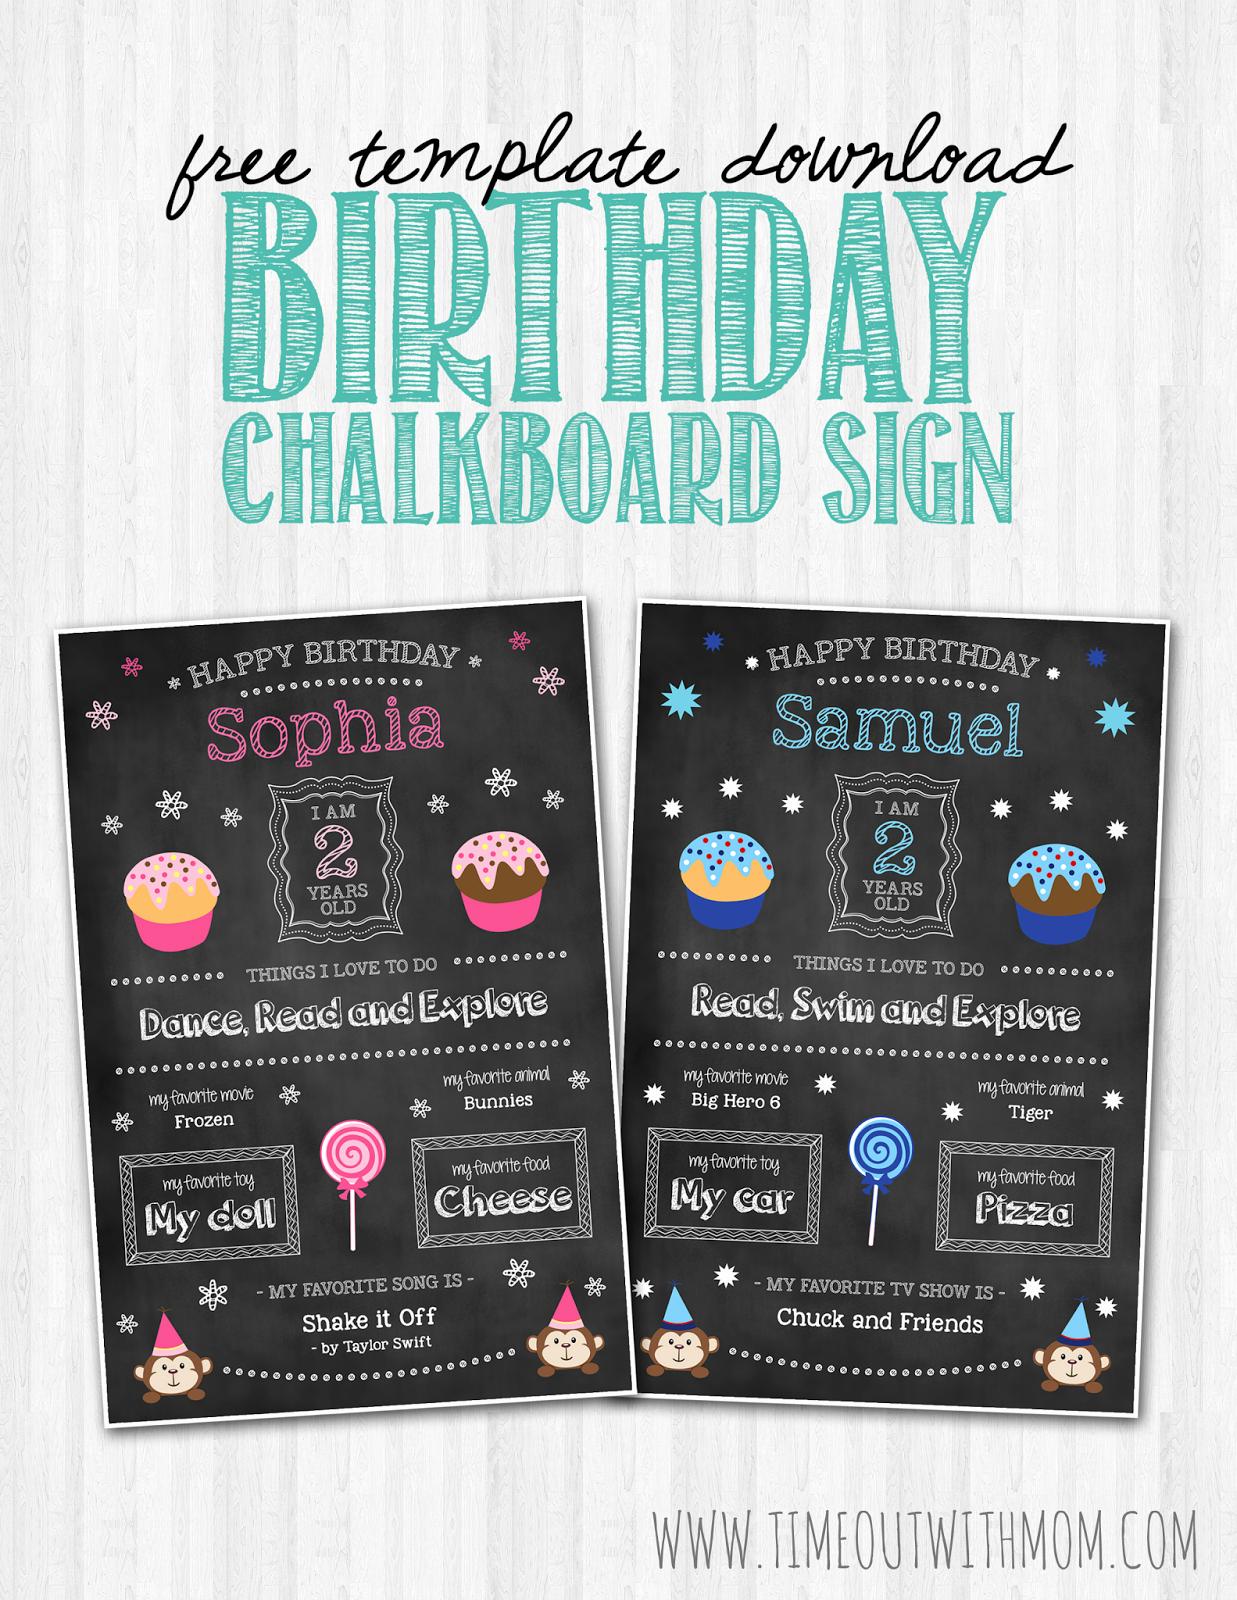 1st Birthday Chalkboard Template Lovely Birthday Chalkboard Sign Template and Tutorial